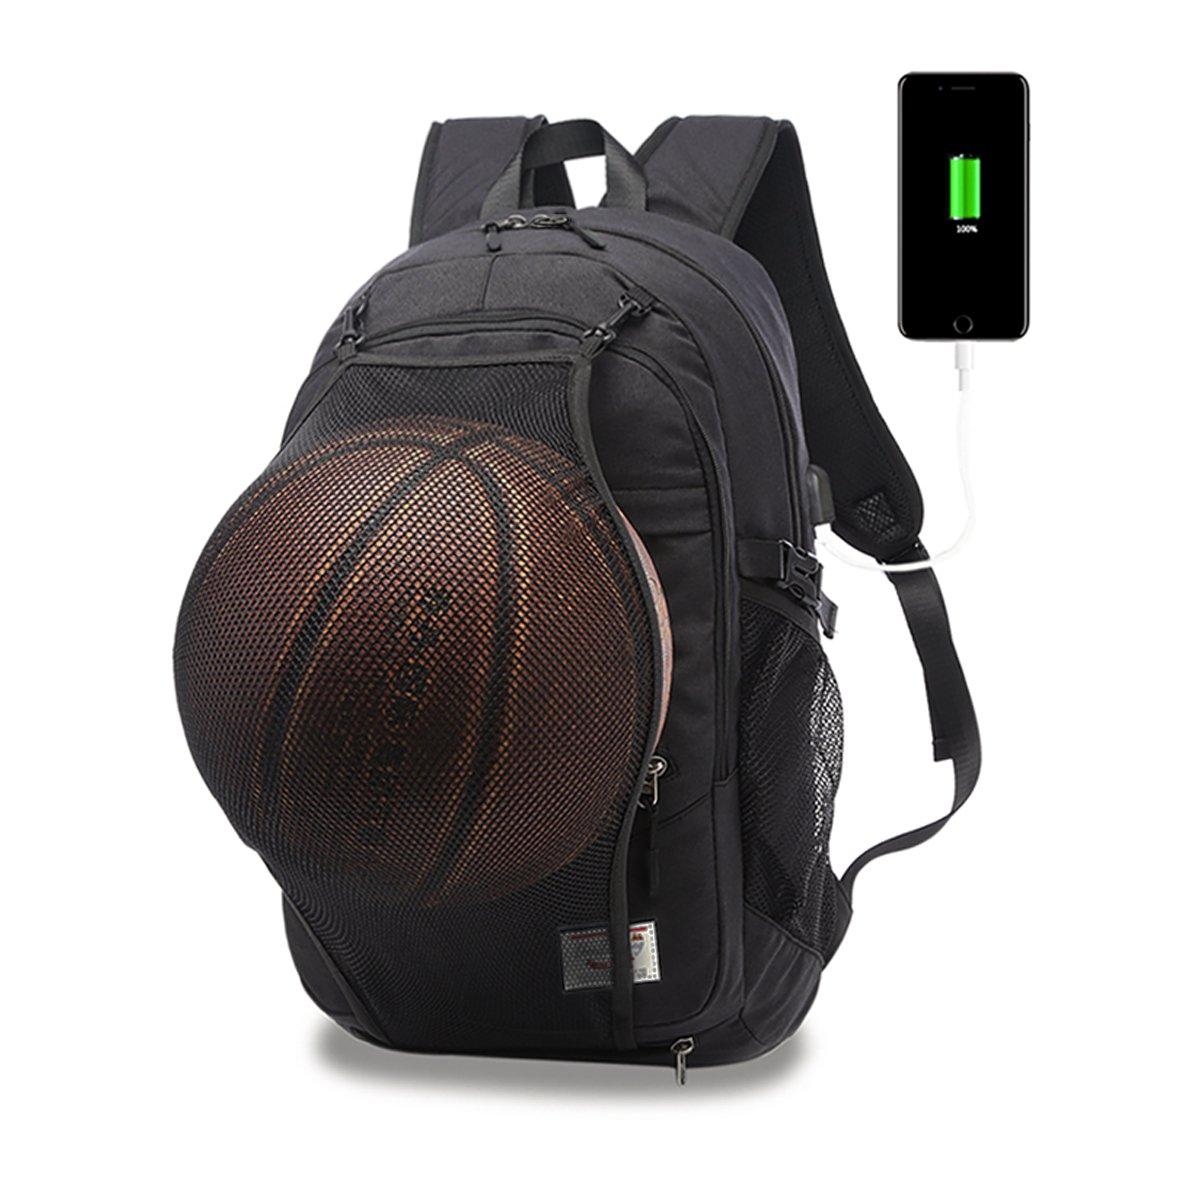 Casual Laptop Backpack College Backpack with Basketball Nets Headphone Port & USB Charging Port Sports Bag School Bag Bookbag Travel Daypack Fits 15.6 Inch Laptop Notebook (Black) on sale